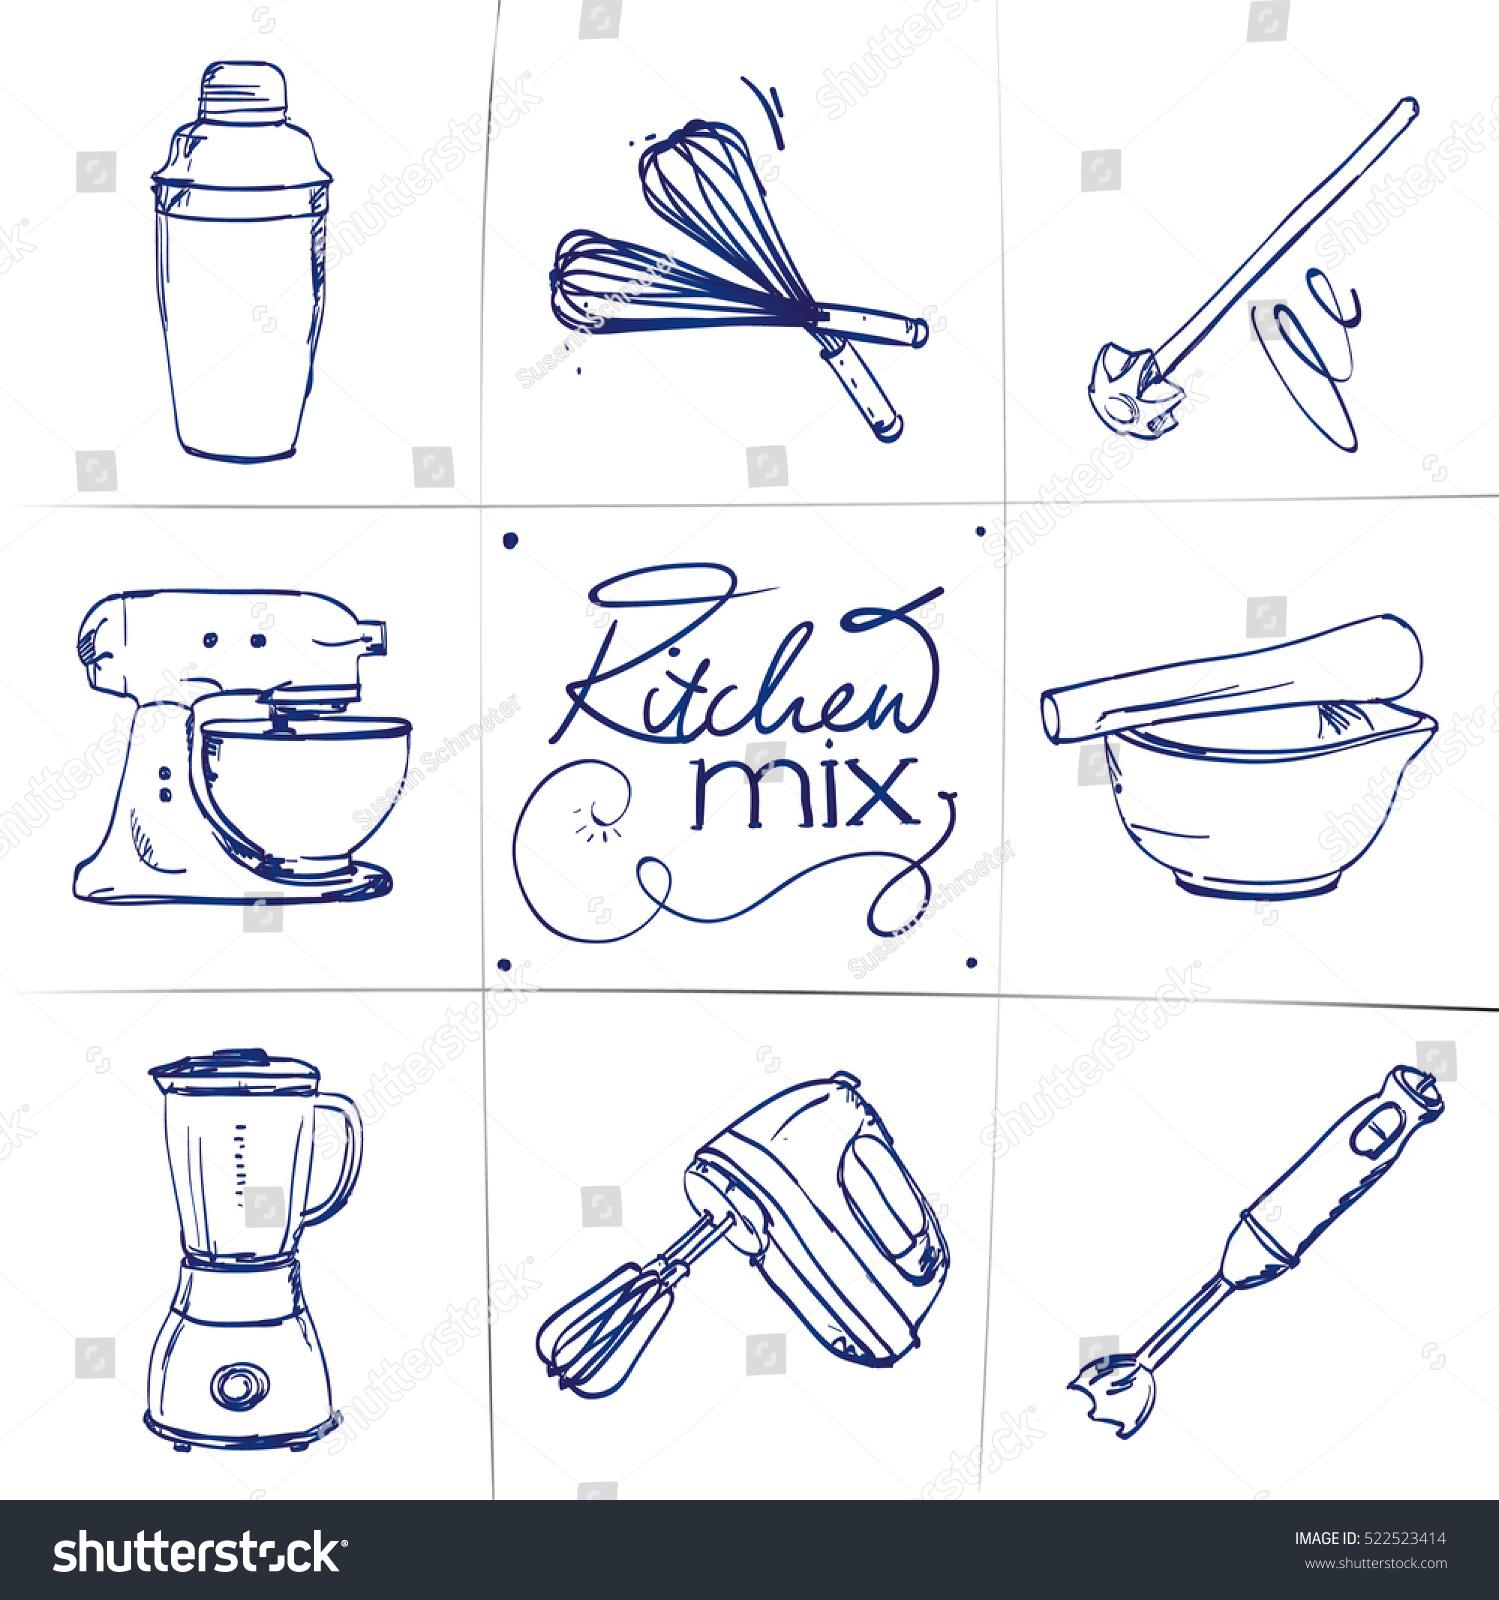 Cartoon Food Processor ~ Doodle set kitchen mixer shaker whisk stock vector